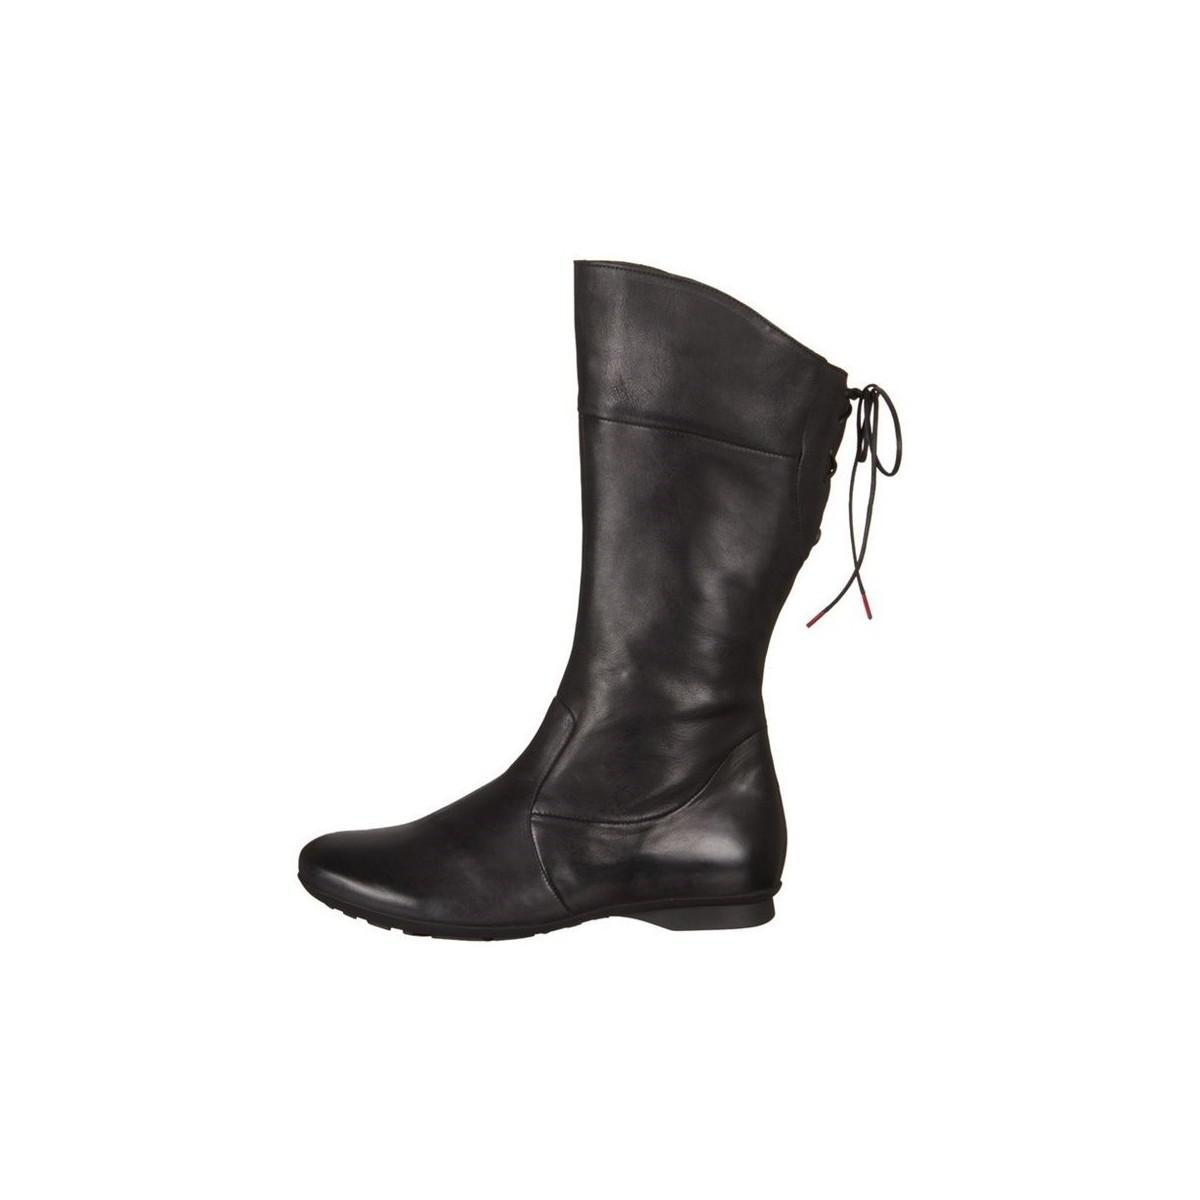 Think! Keshuel Soft Calf Veg Women's High Boots In Multicolour in Black